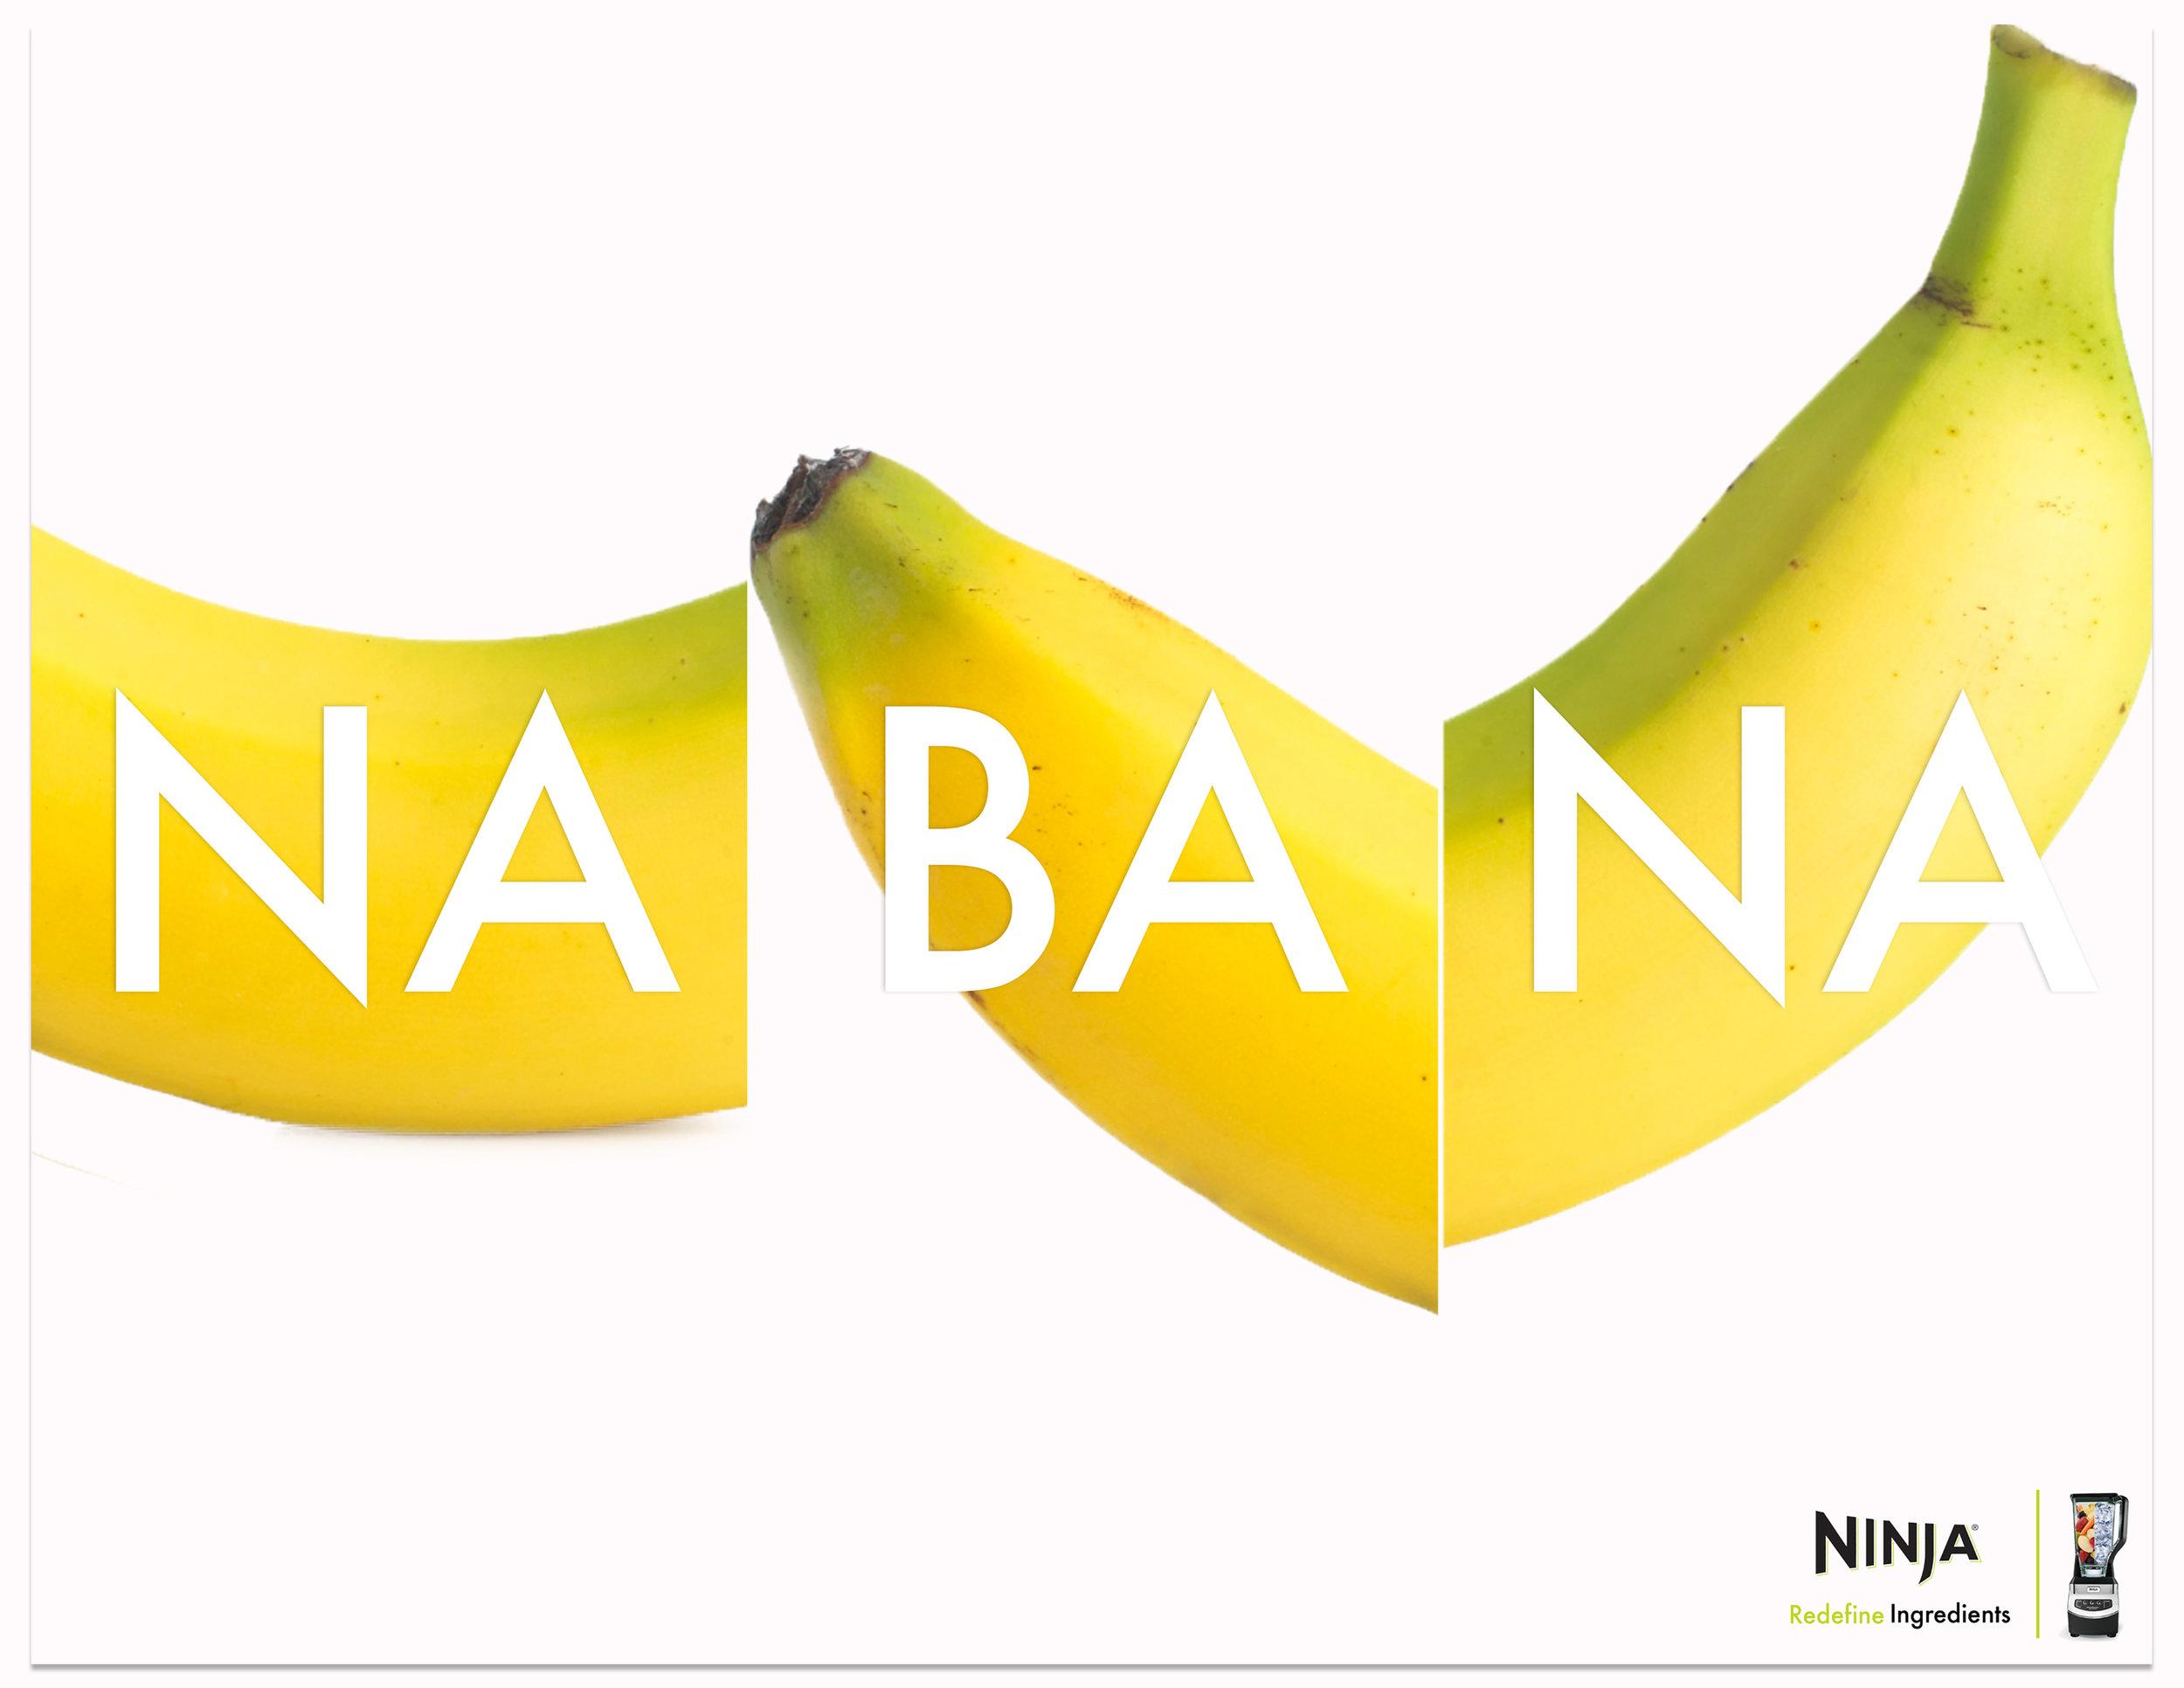 NINJA|Redefine|Bananaa|HD2.jpg